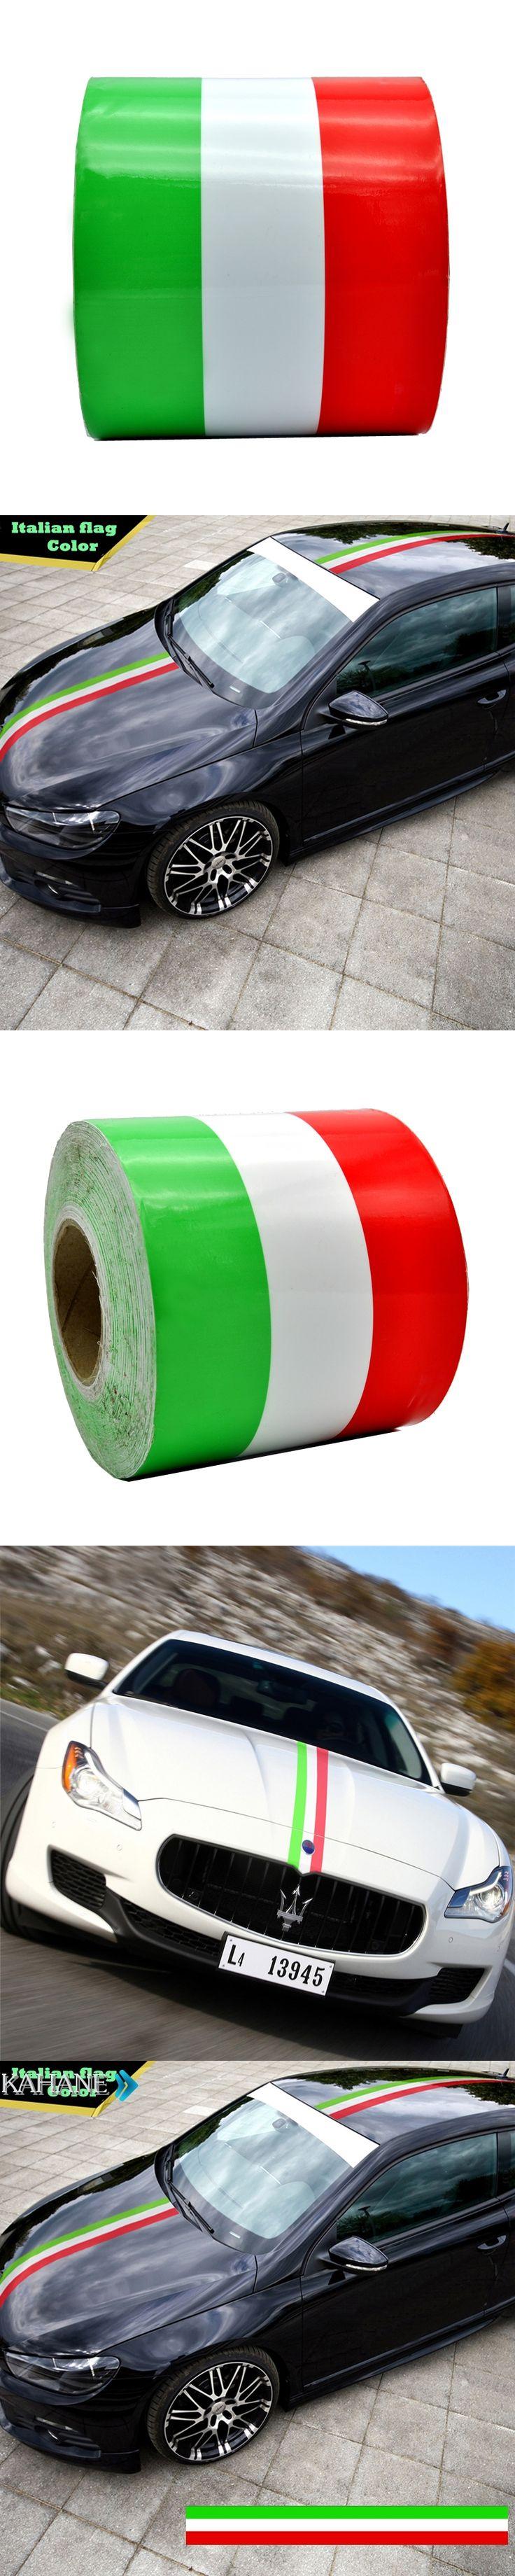 Italy Flag Stripe Car Body Hood Vinyl Sticker Decal Styling for Audi A3 A4 A6 B5 B6 B7 B8 C5 C6 C7 Q7 TT 80 Q5 8P